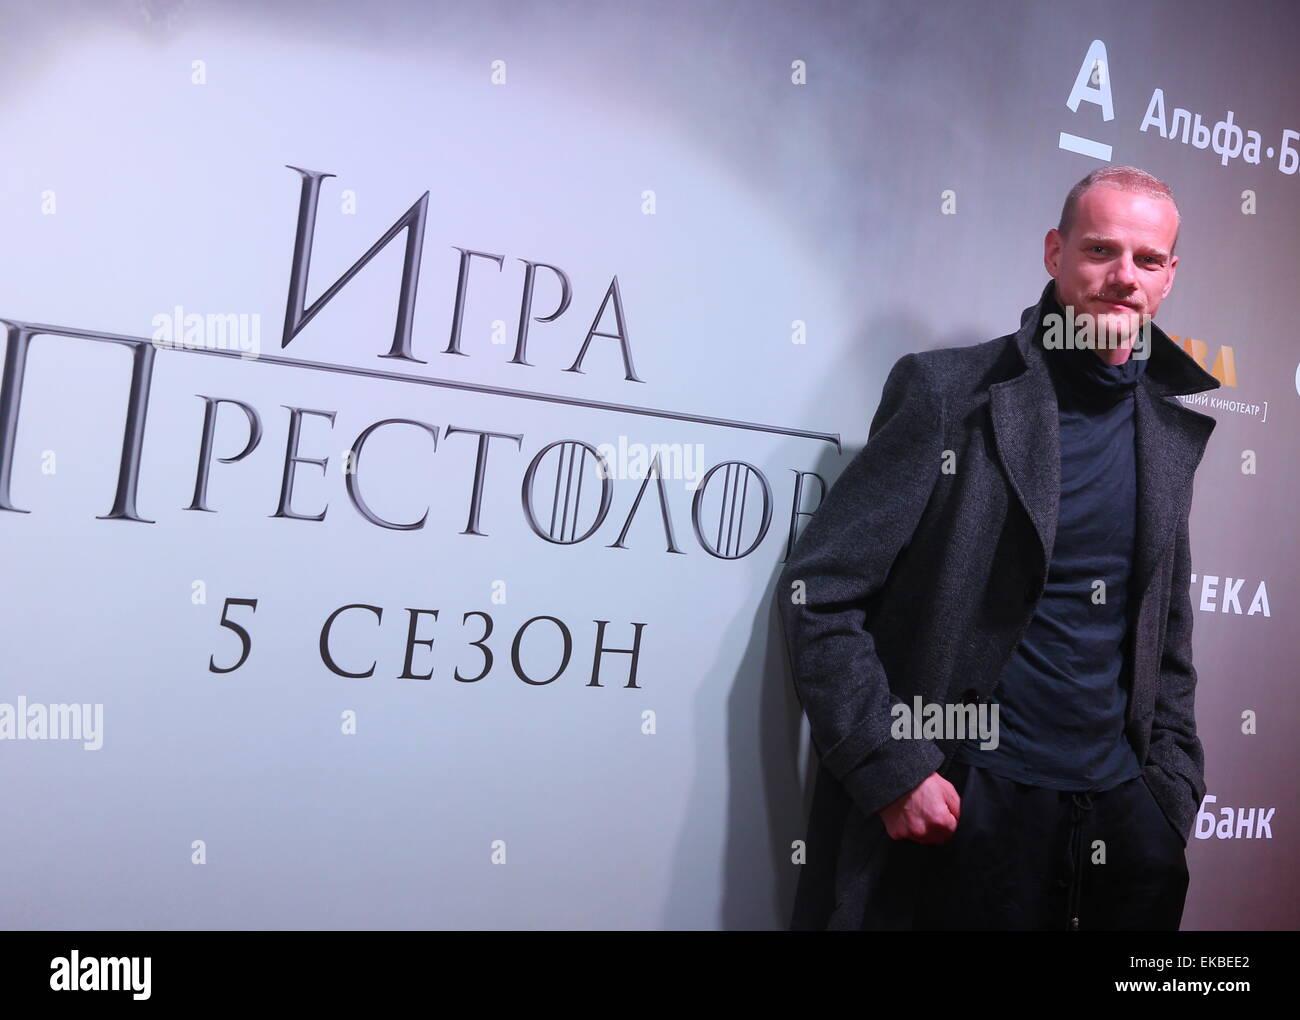 Russian actor in the Game of Thrones. Yury Kolokolnikov 14